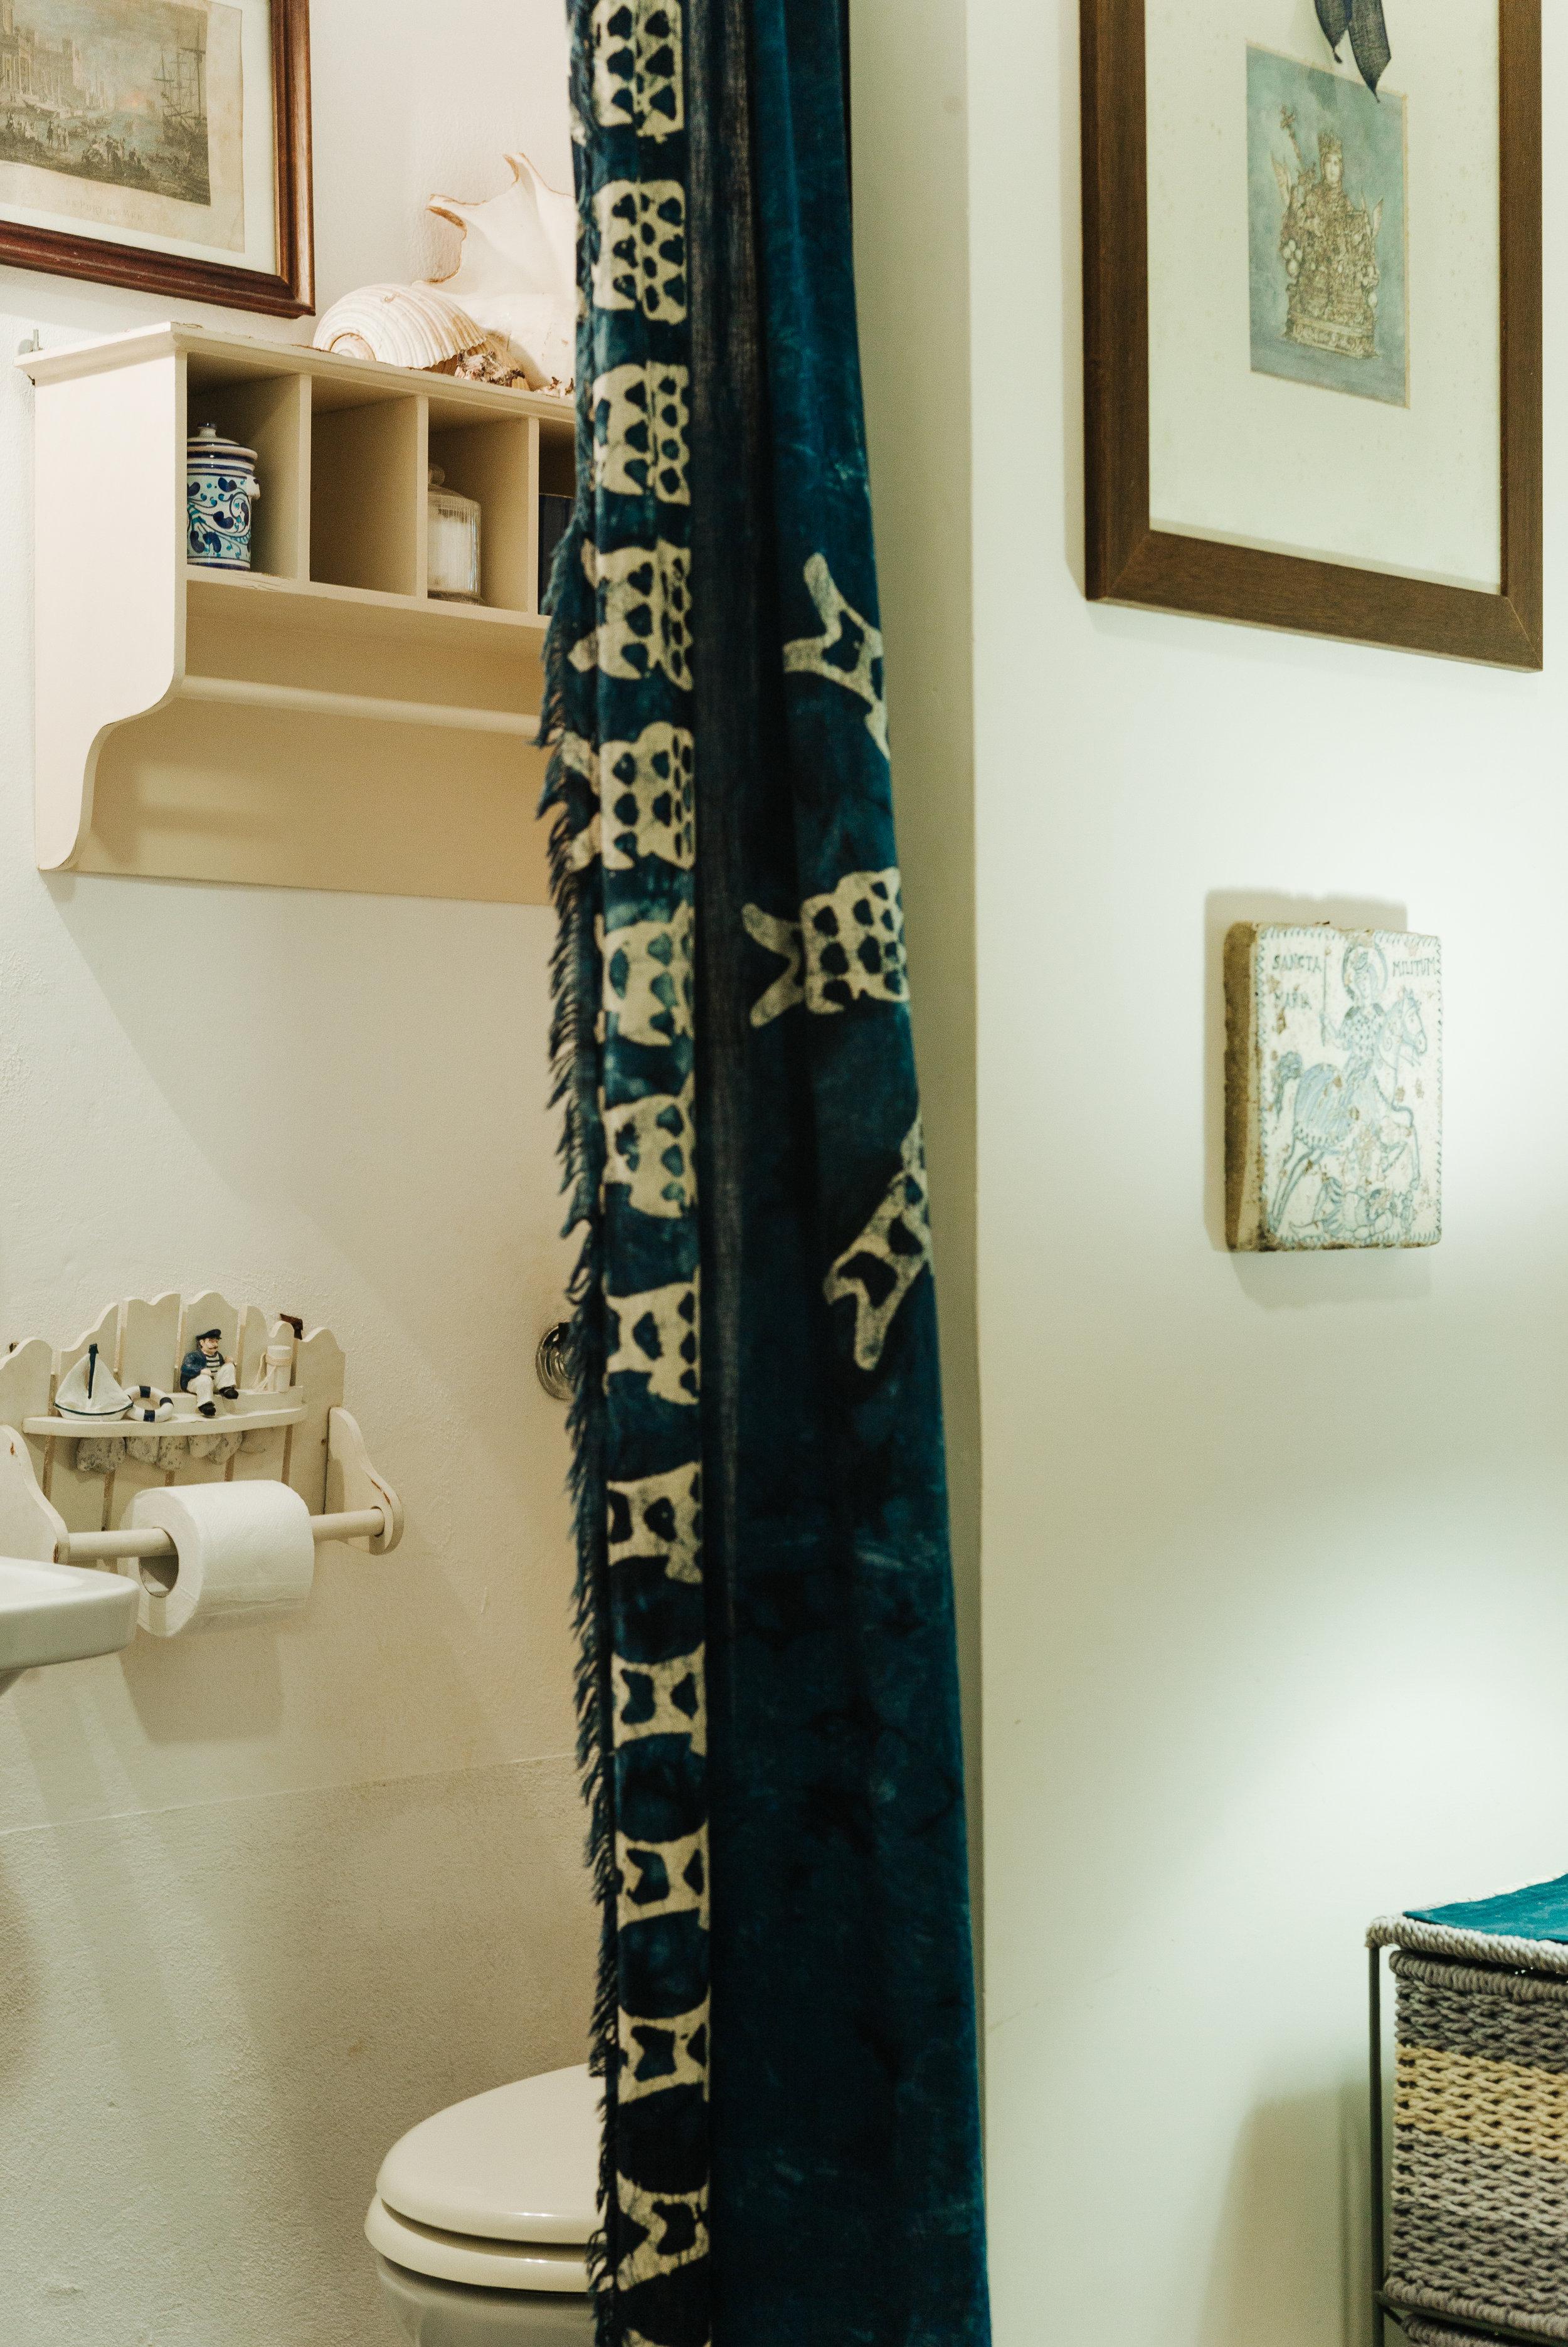 22sampieri-casa-vacanze-sicilia-appartamento-sicily-holiday-apartment-casazzurra-italia-italy.jpg